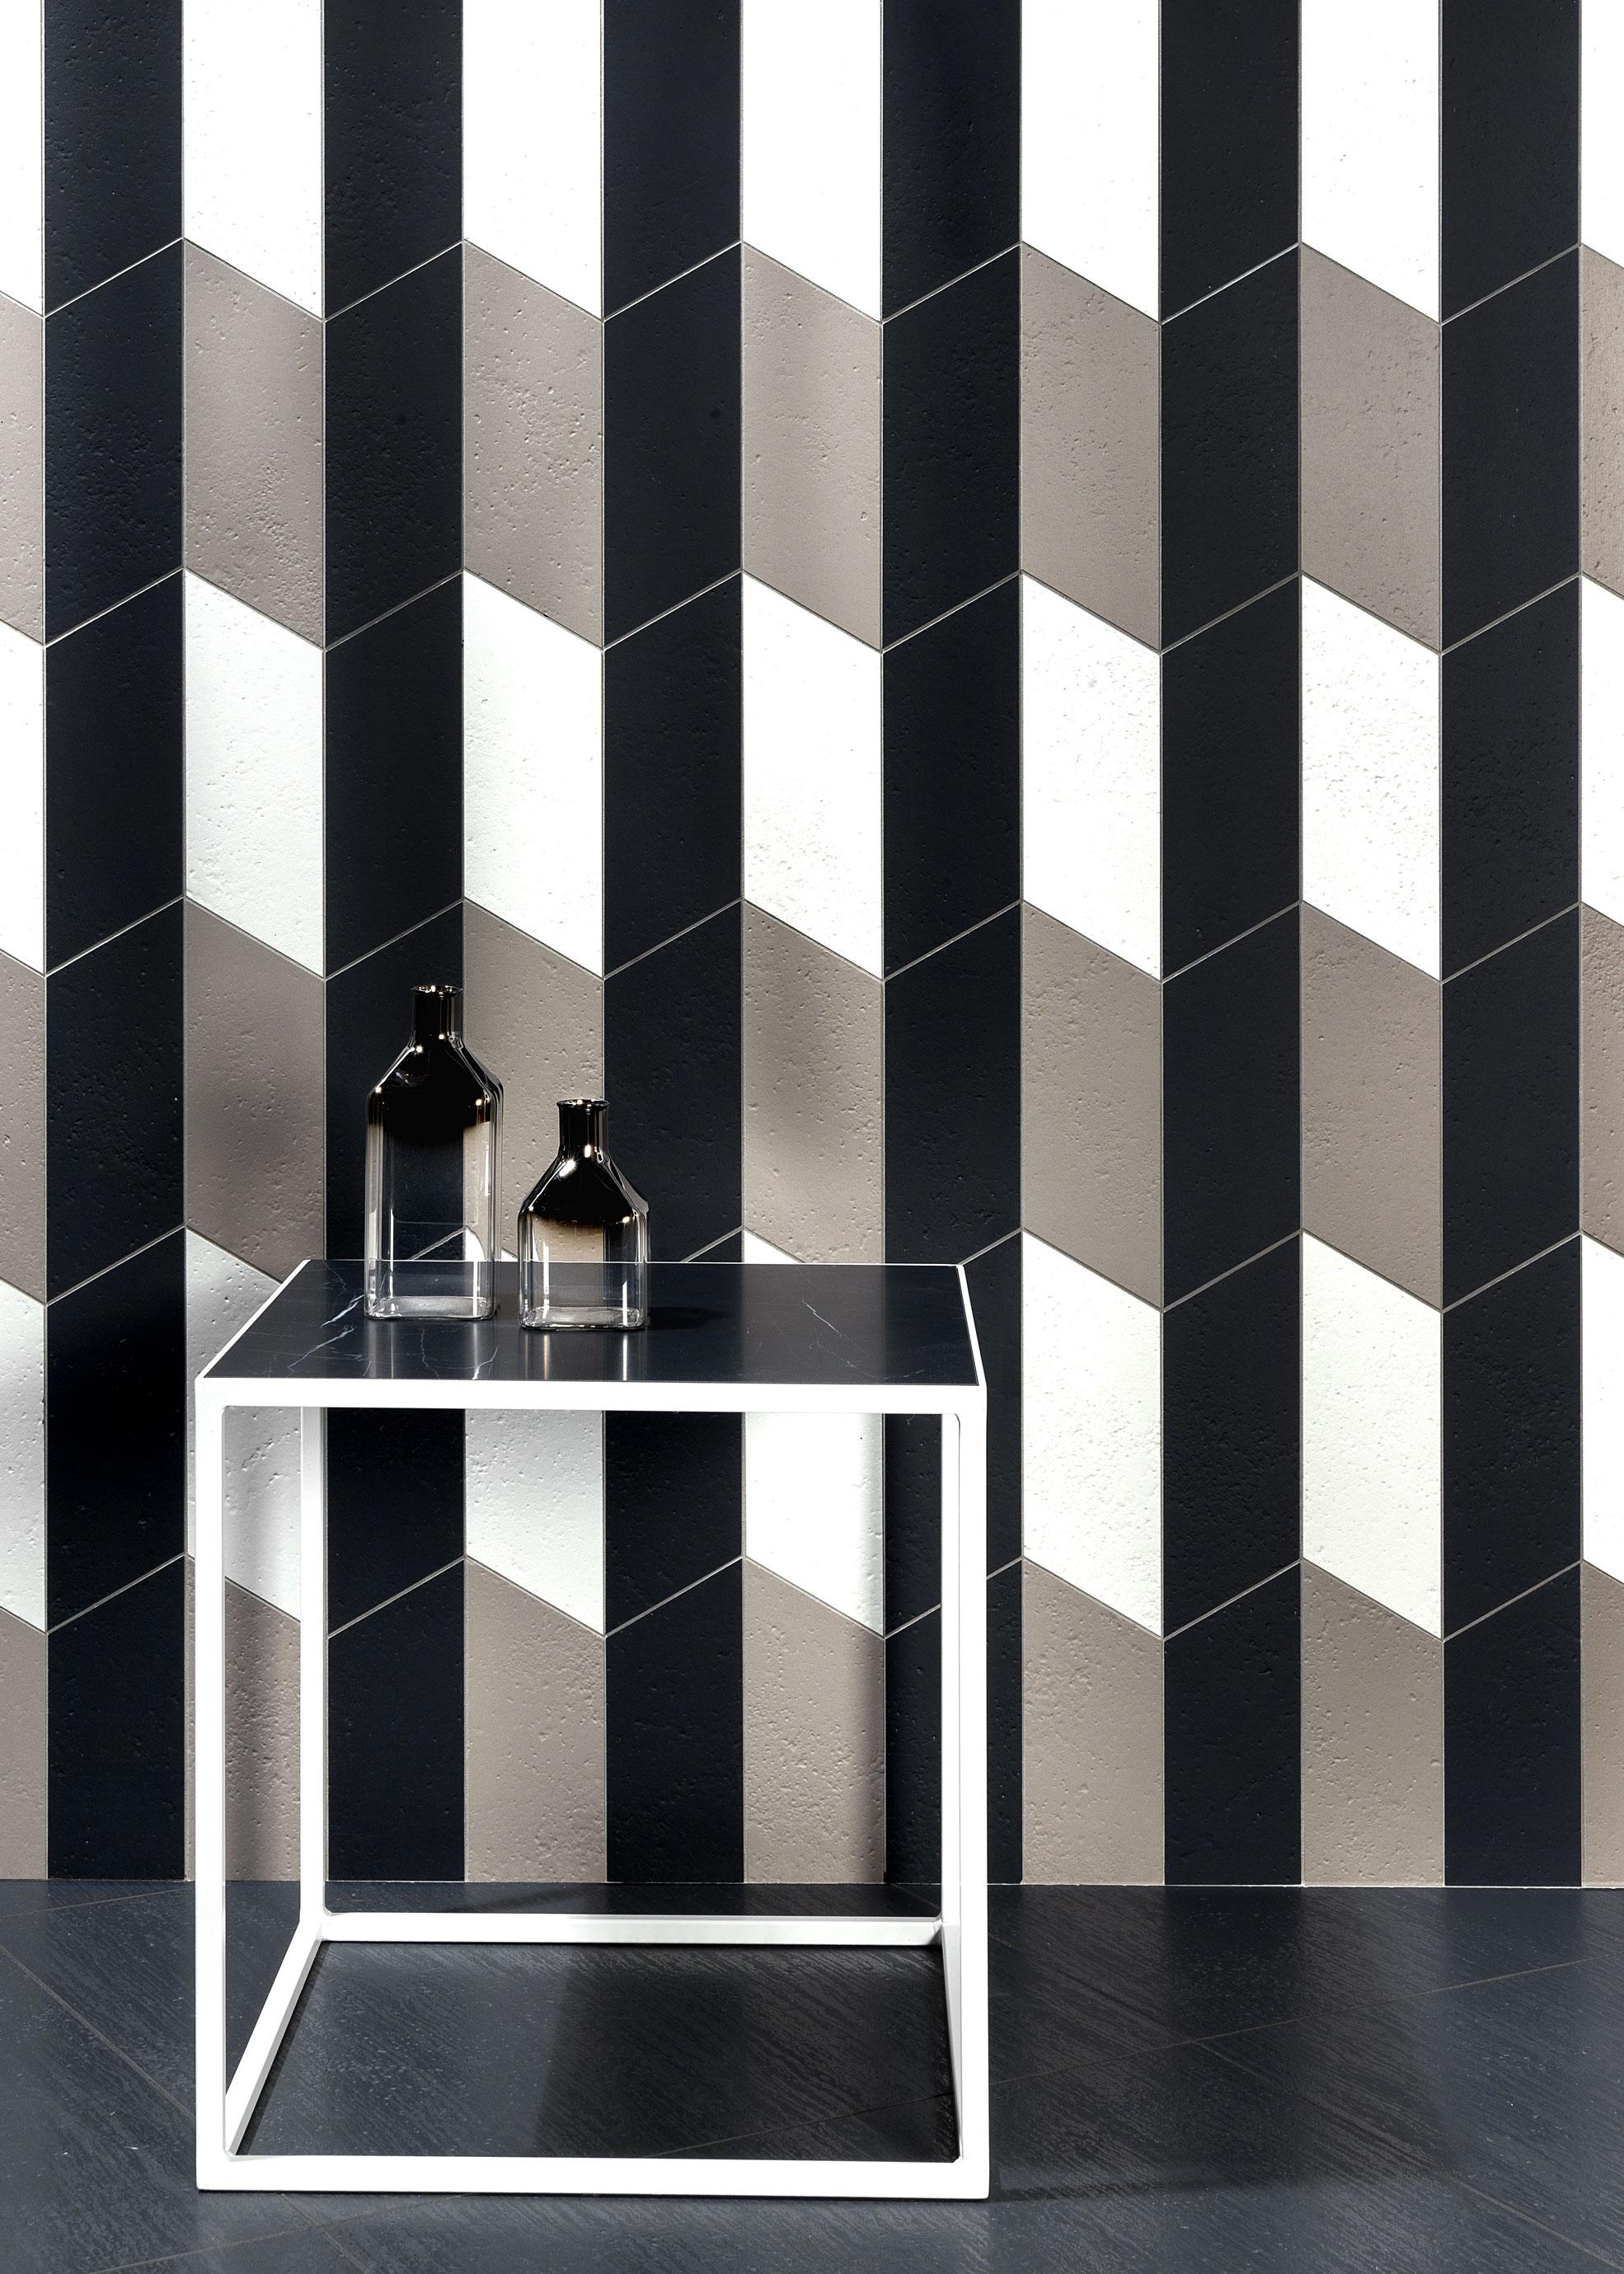 Coffe table and black and white tiles of Acqua Maximum collection of Graniti Fiandre Photographer Maria Teresa Furnari